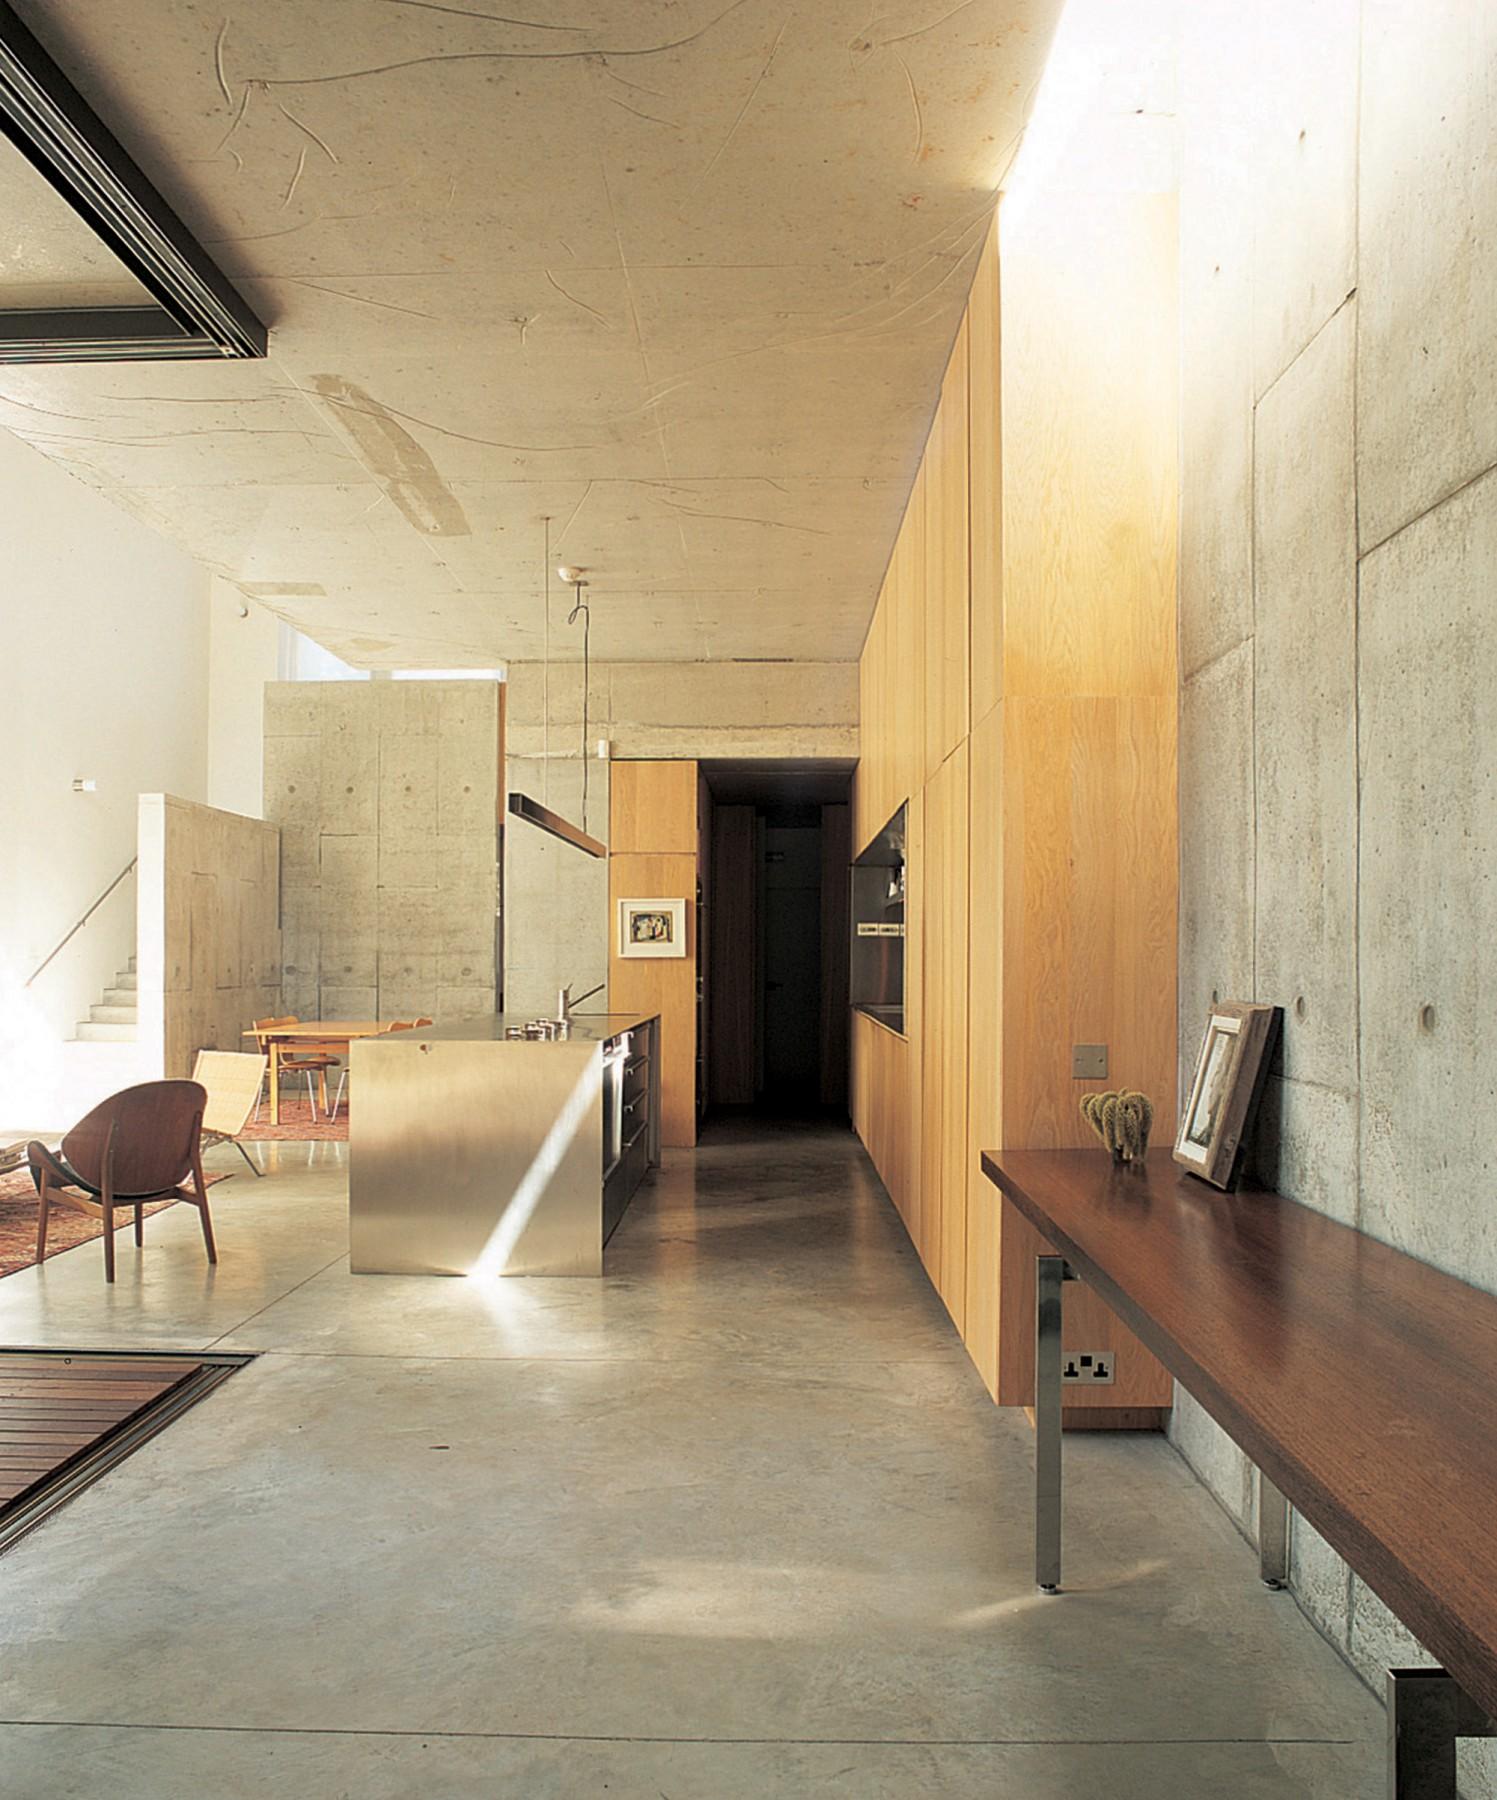 Kander-house-Primrose-hill-London-residential-home-contemporary-interior-Riba-award-victorian-Jamie-Fobert-Architects-3